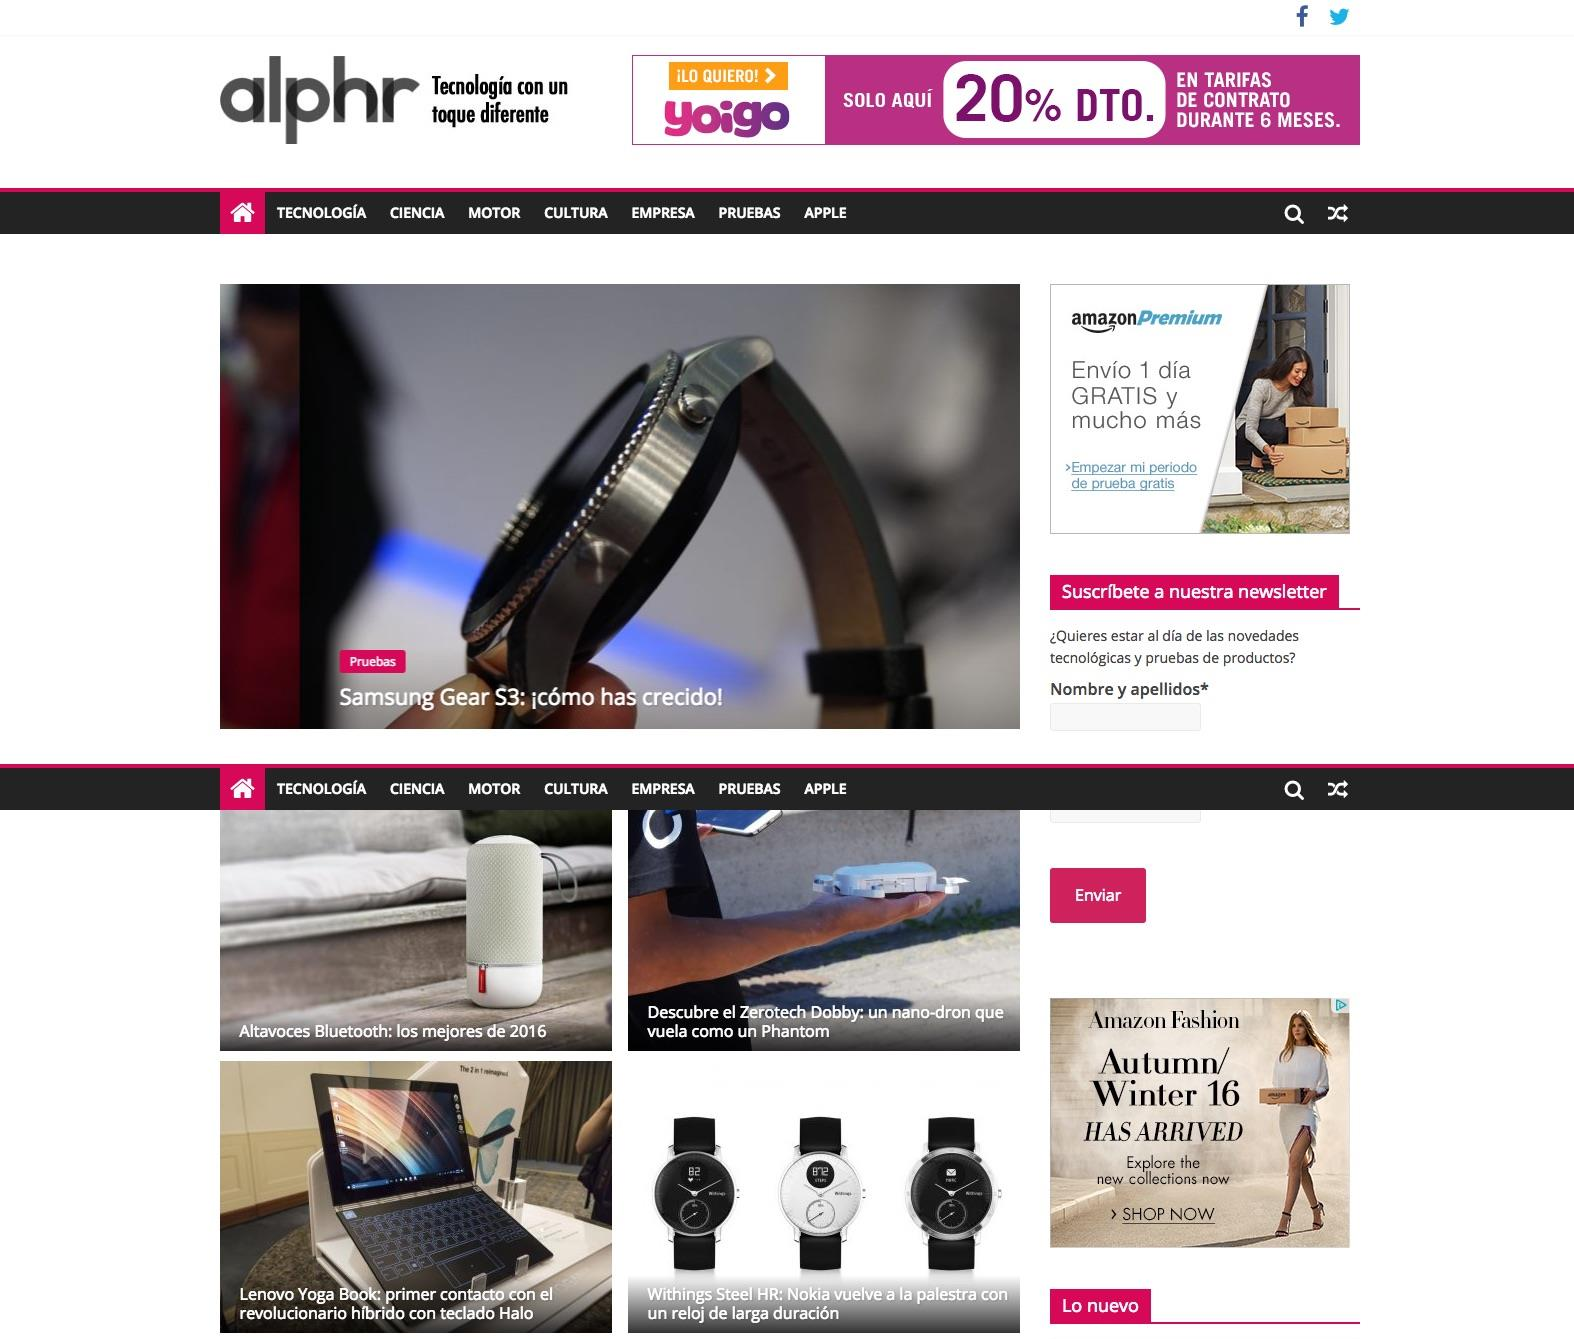 Wannacom Comunicacion launches Alphr es in Spain | News